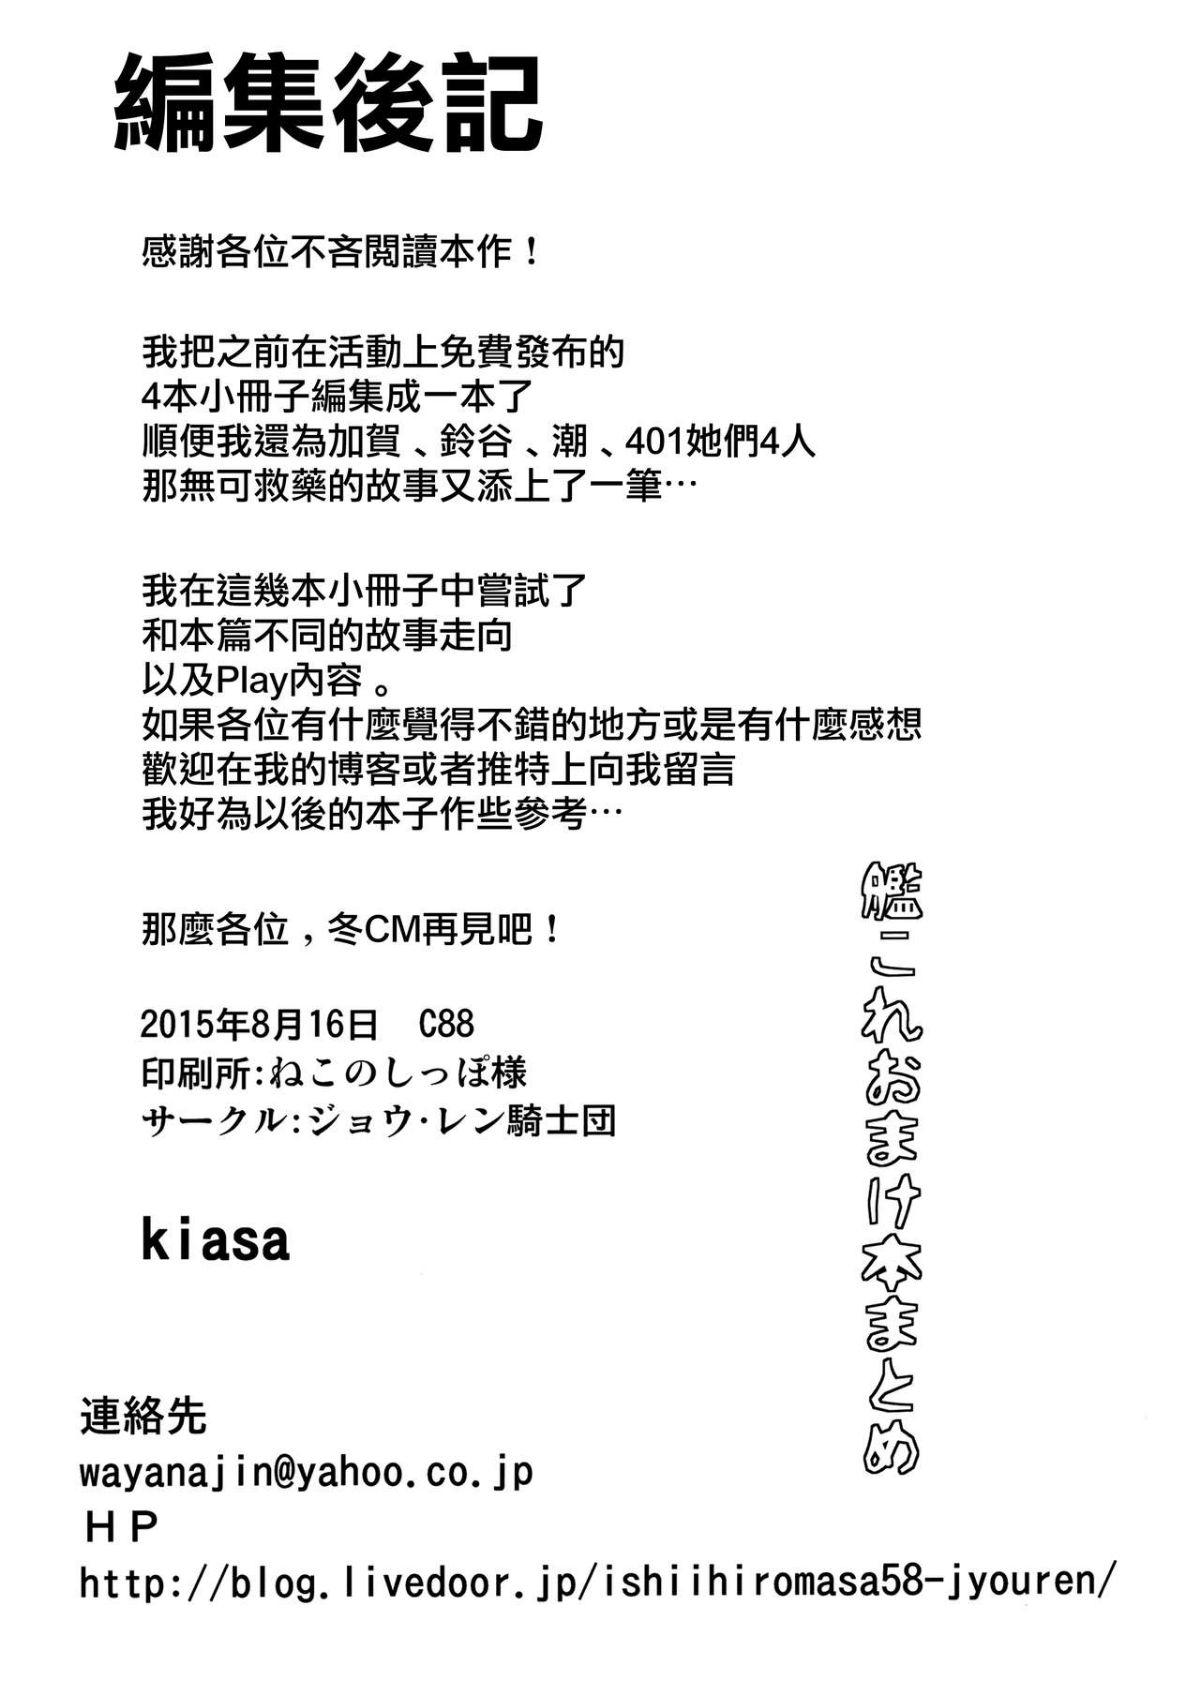 MJK_18_T1393_053.jpg